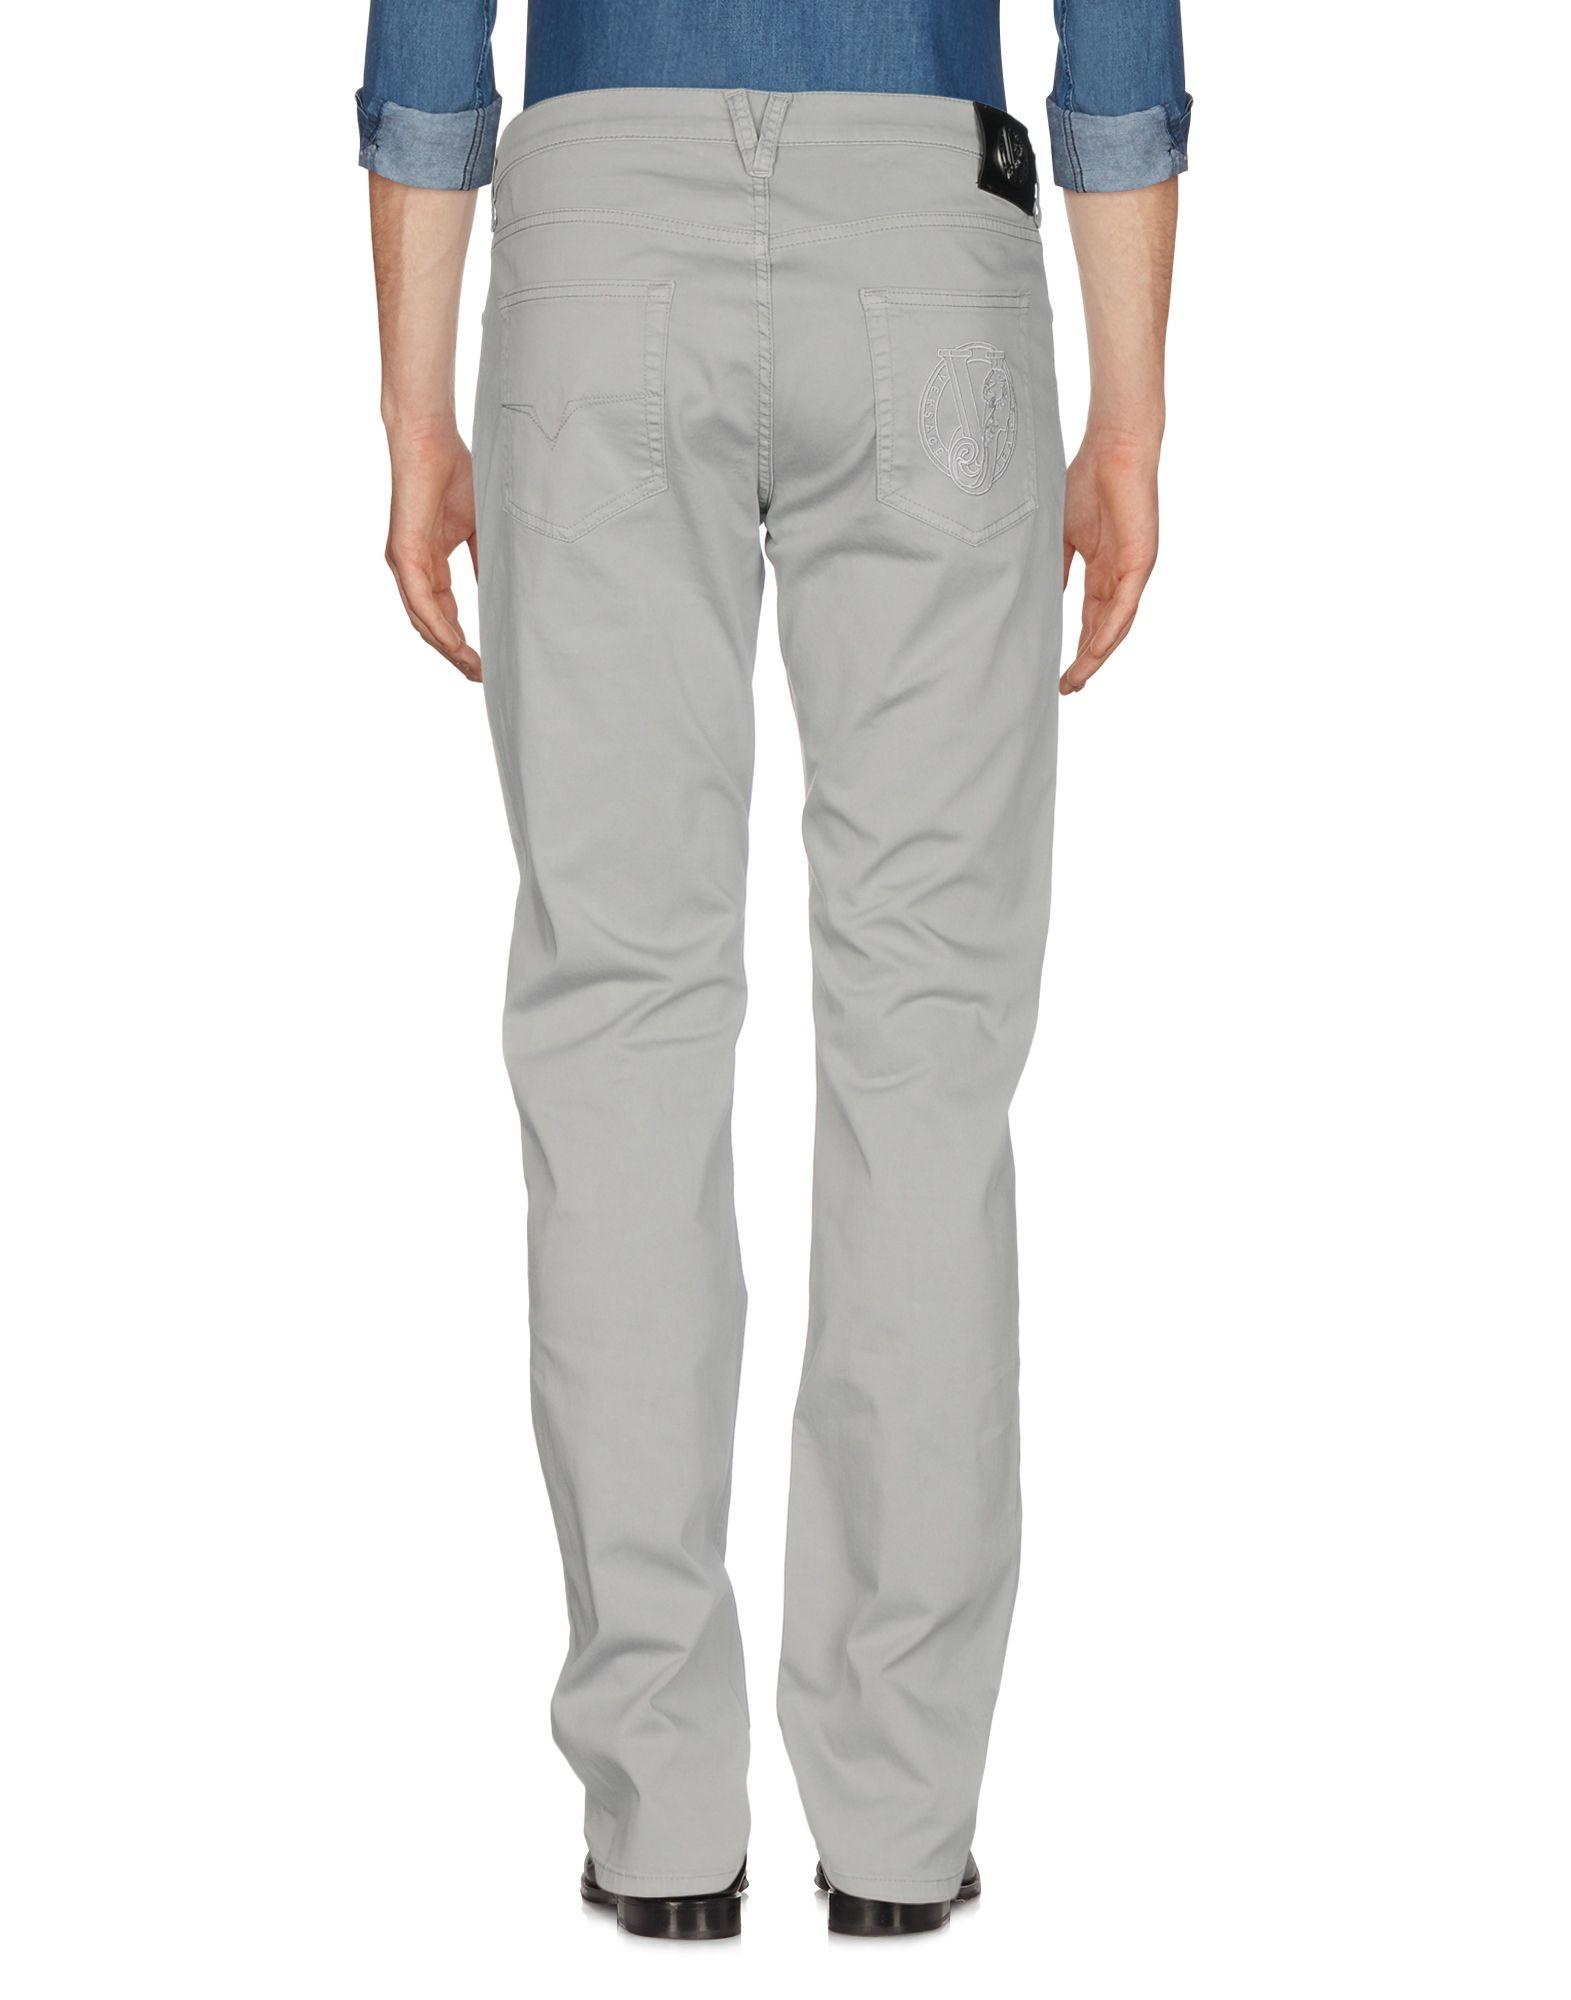 5 Tasche Versace Jeans Uomo Uomo Jeans - 13162909UH eabcf3